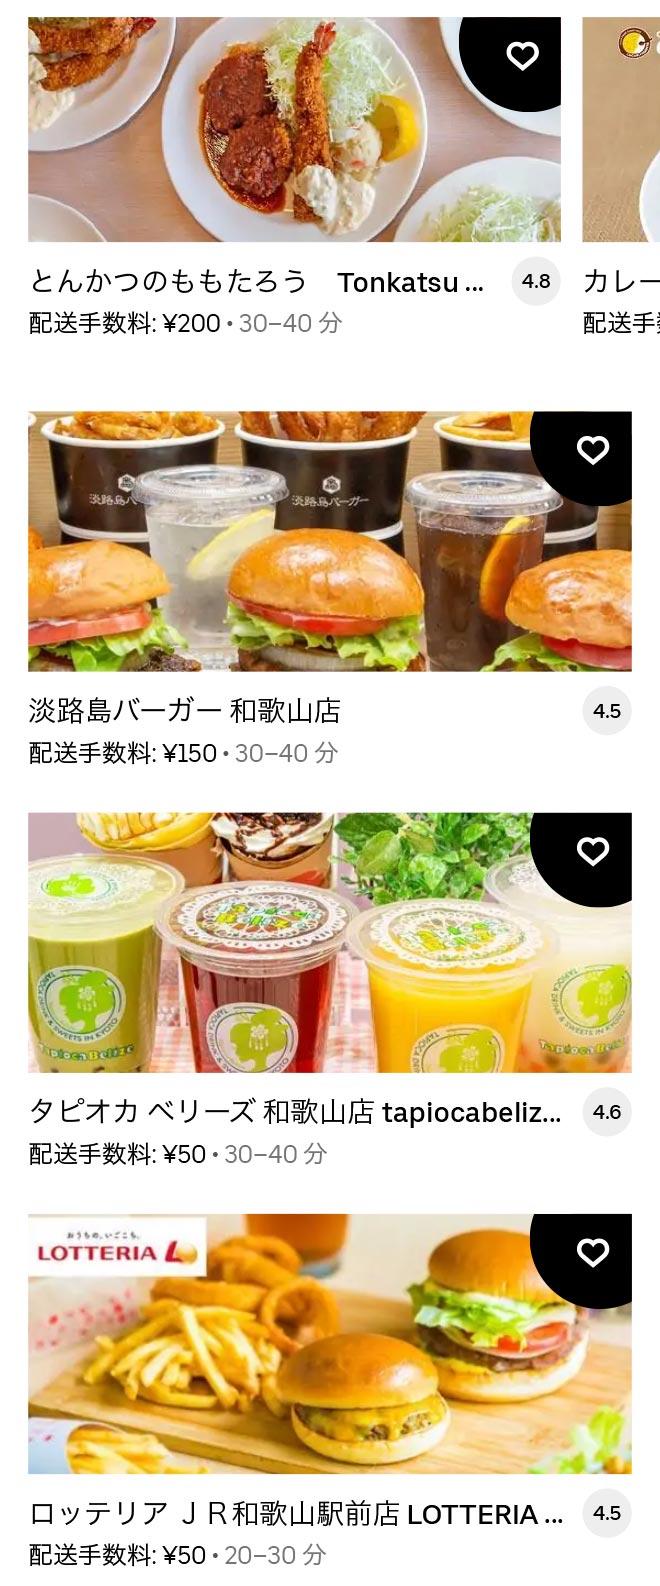 U wakayama menu 2104 02